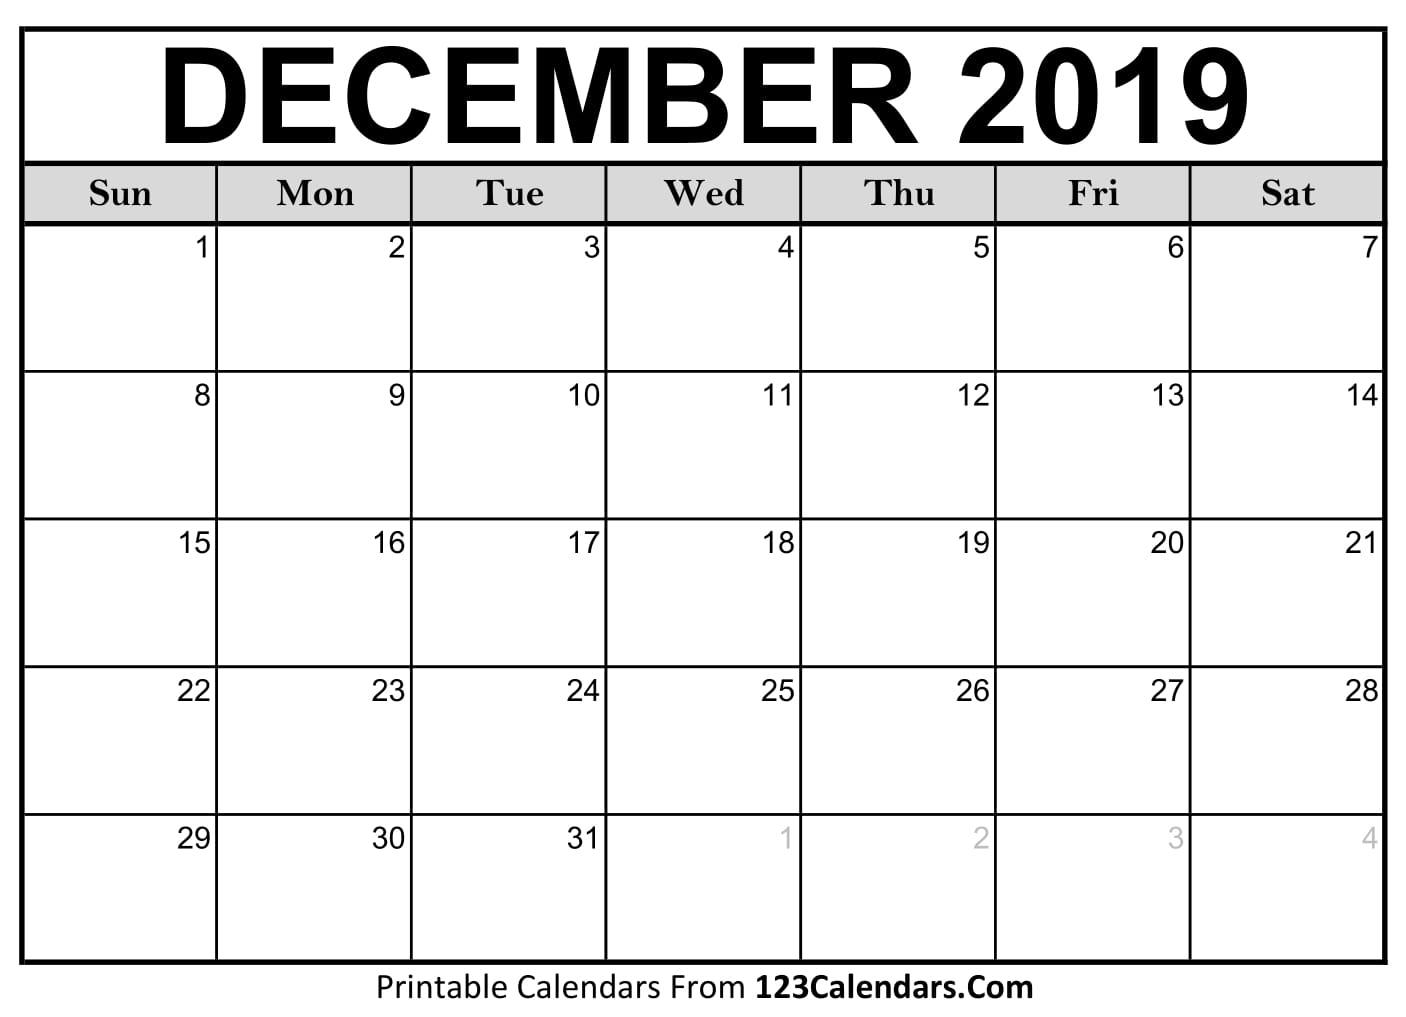 December 2019 Printable Calendar | 123Calendars in Blank Calendar Printable December